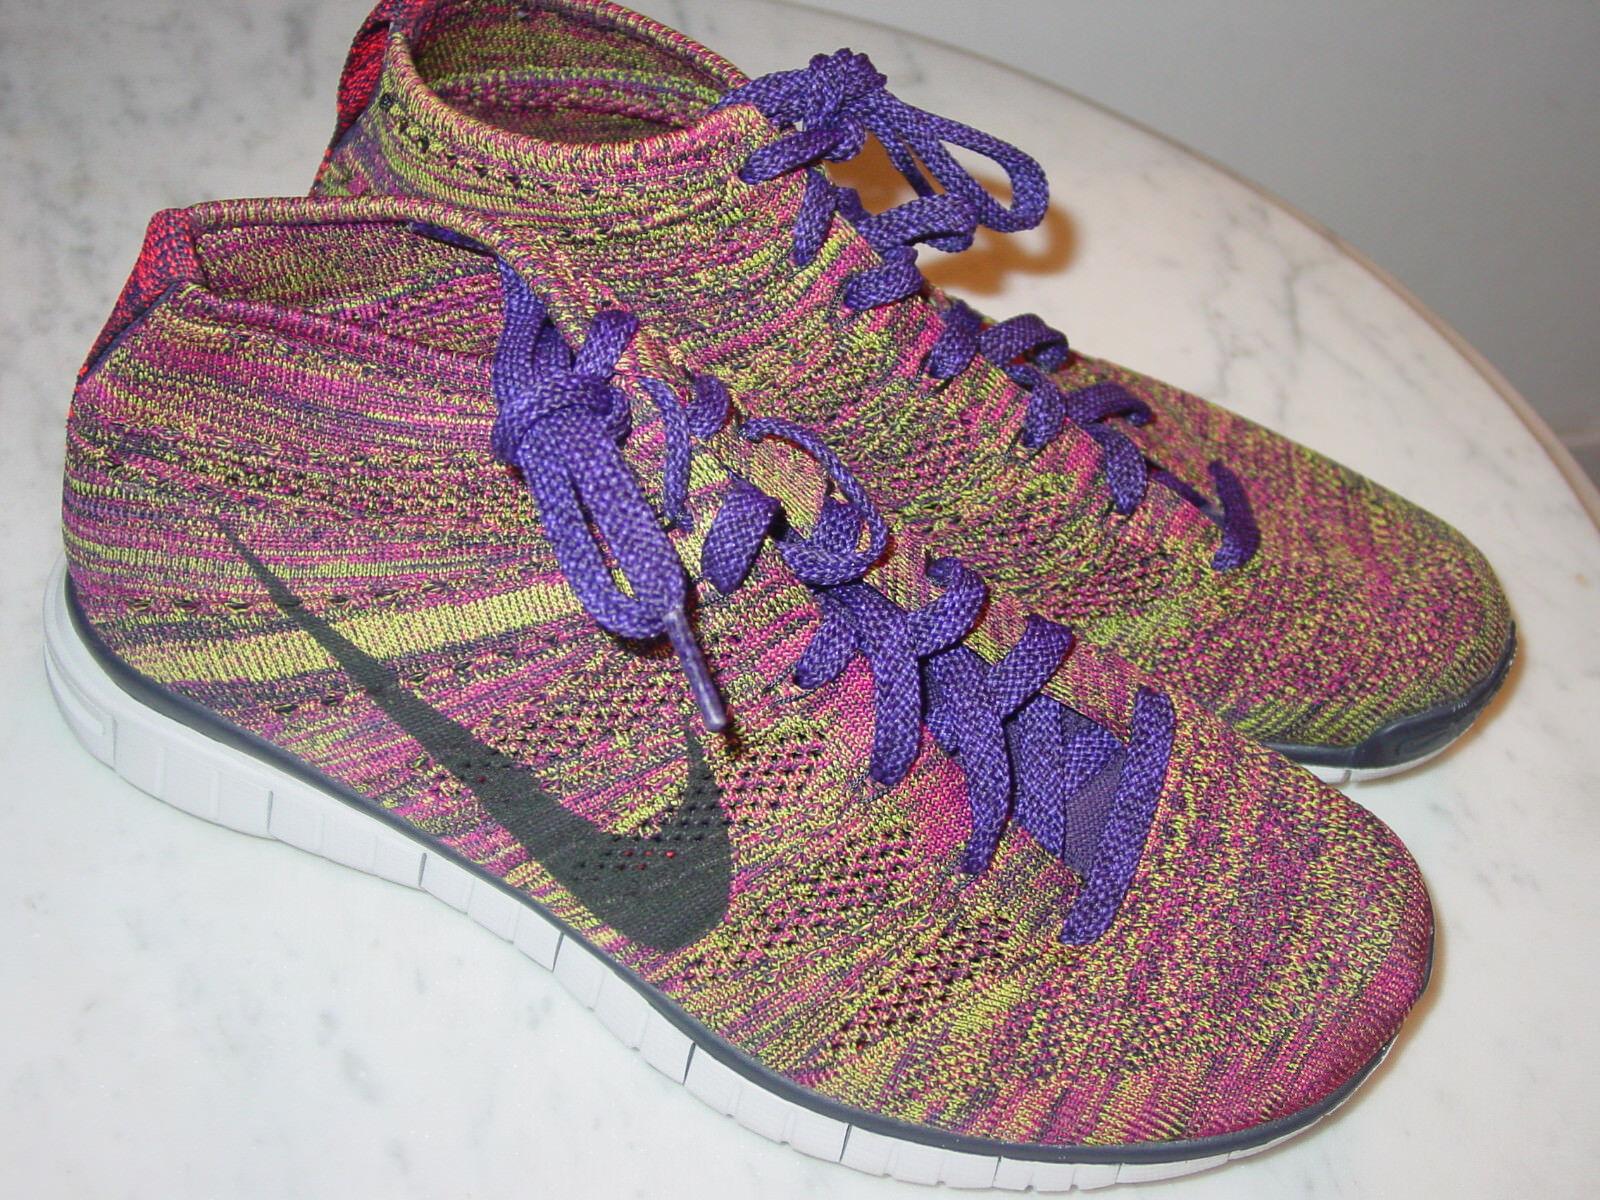 2014 Nike Free Flyknit Chukka Grand Purple/Black/Fireberry Shoes  Size 9.5